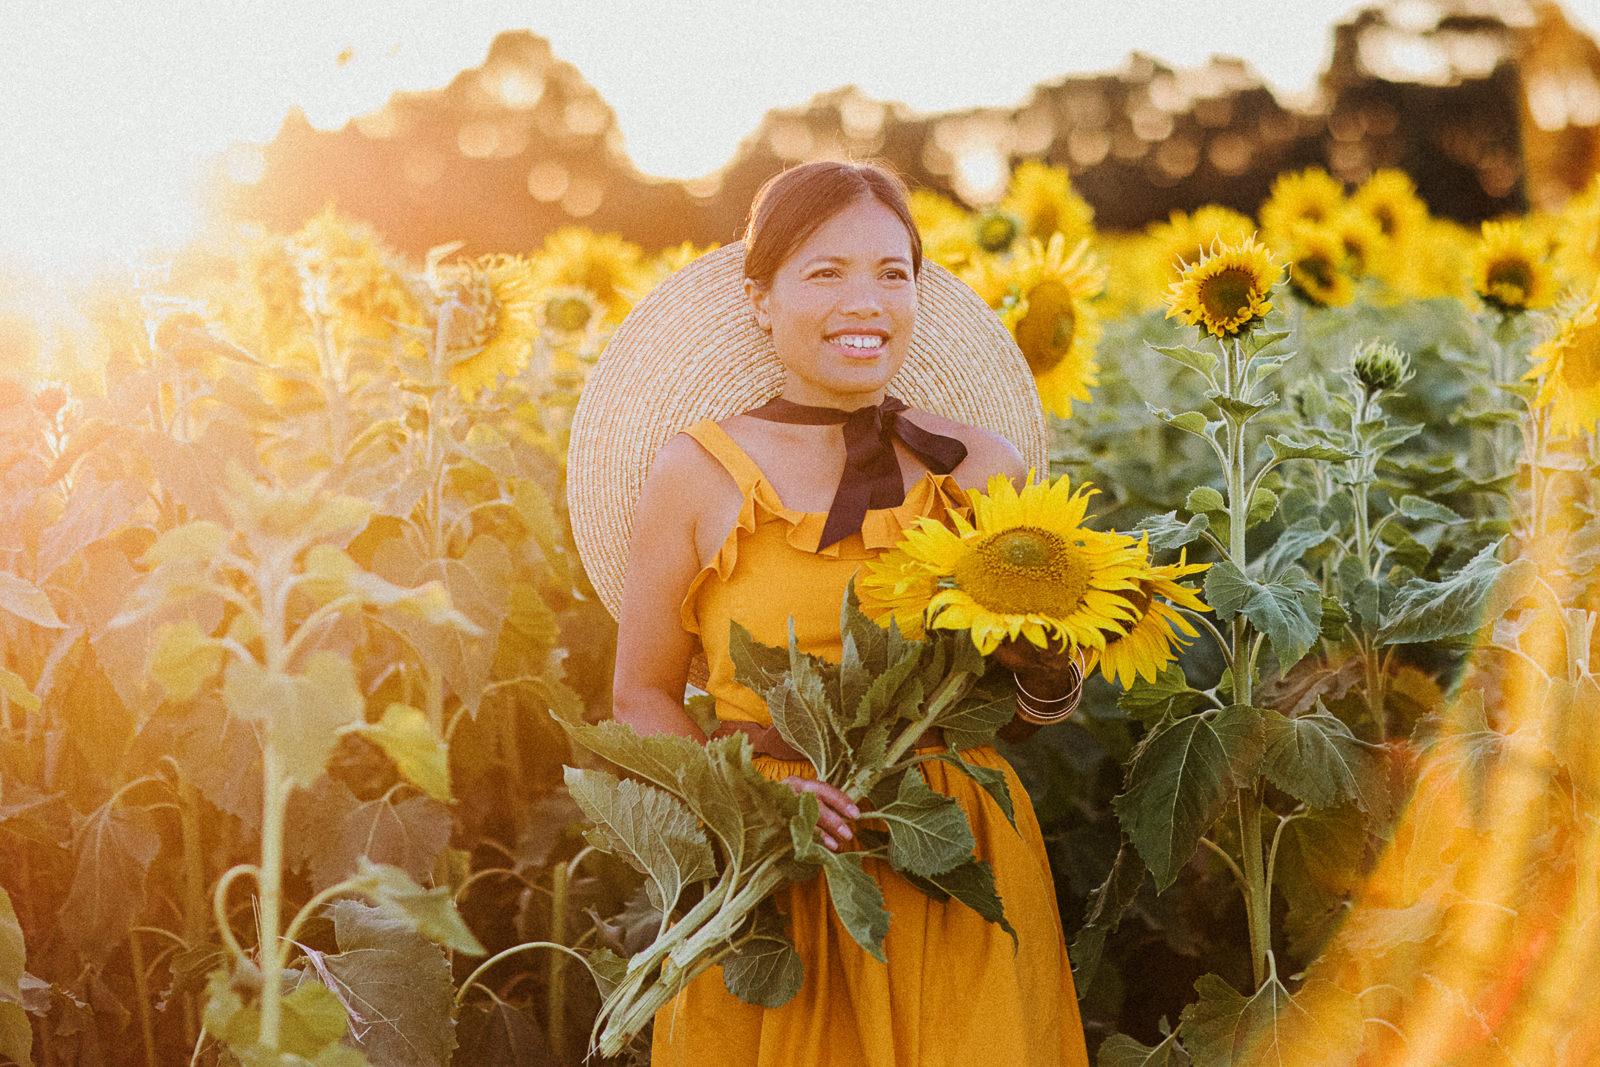 sunset - girl picking sunflowers in field at sunset - creative sunflower photos